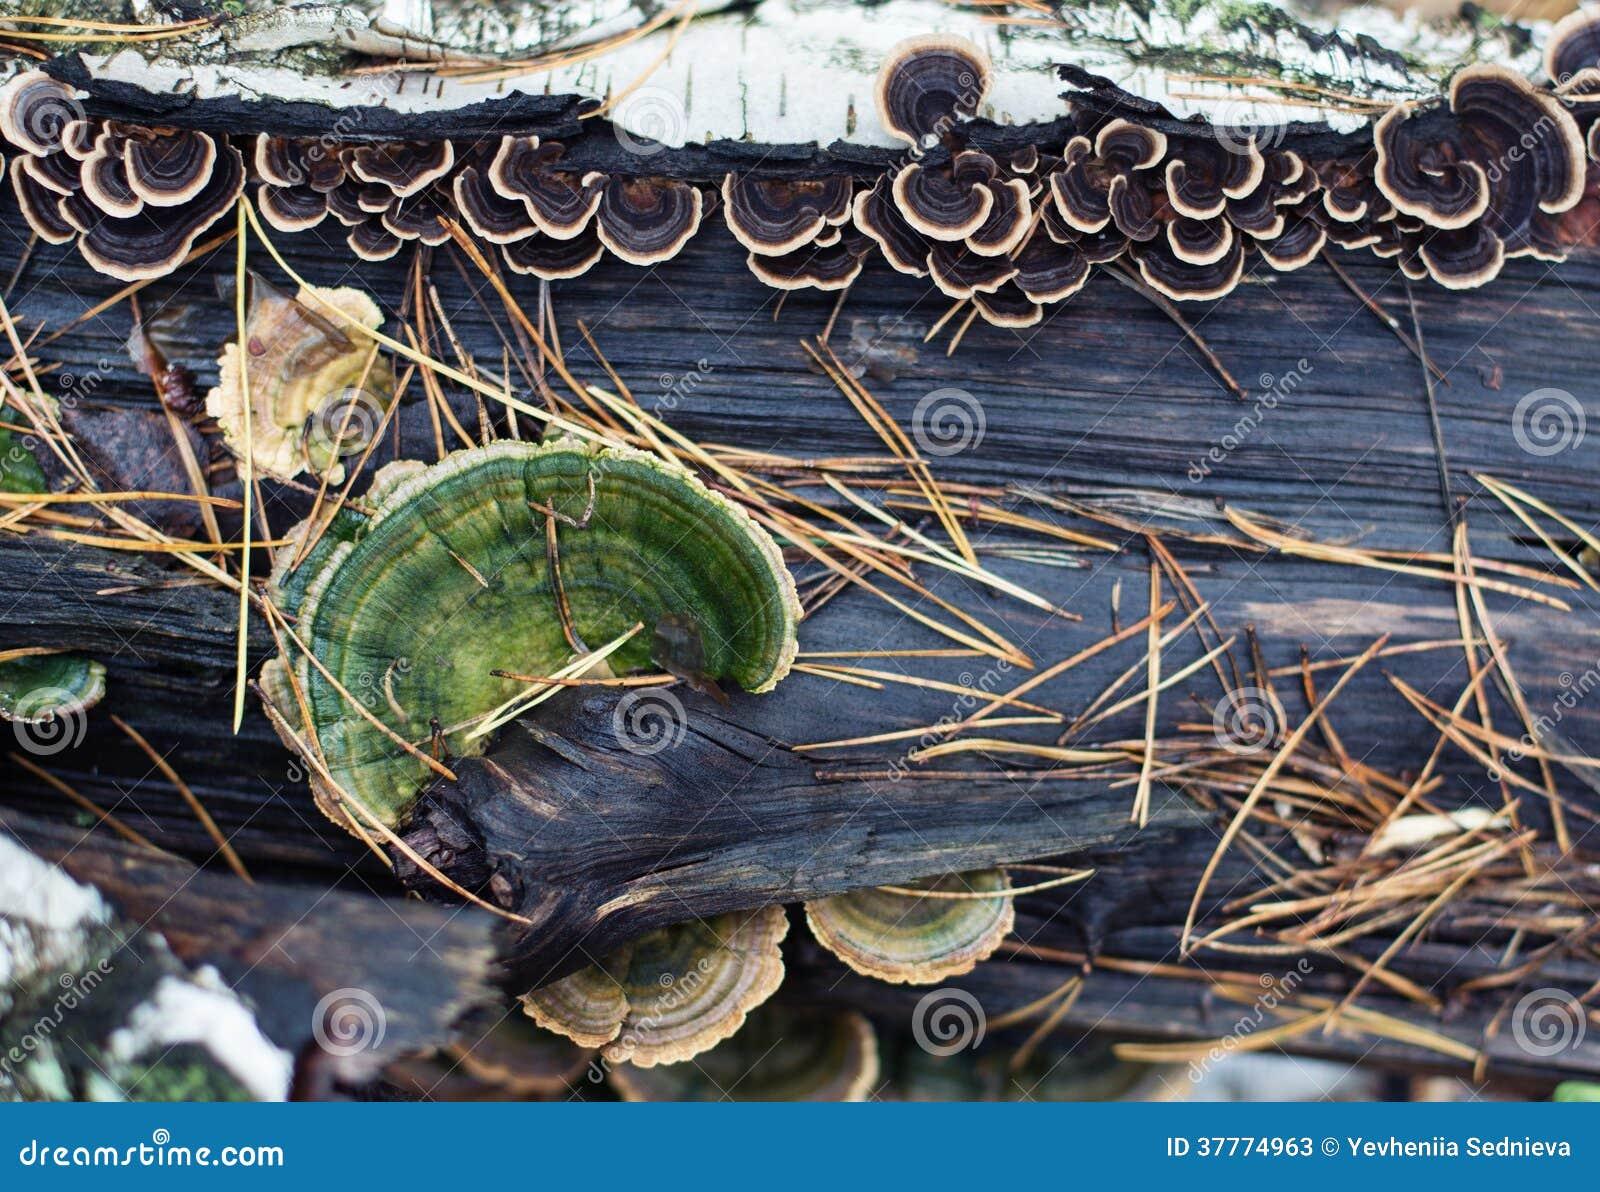 Nature background of mushrooms